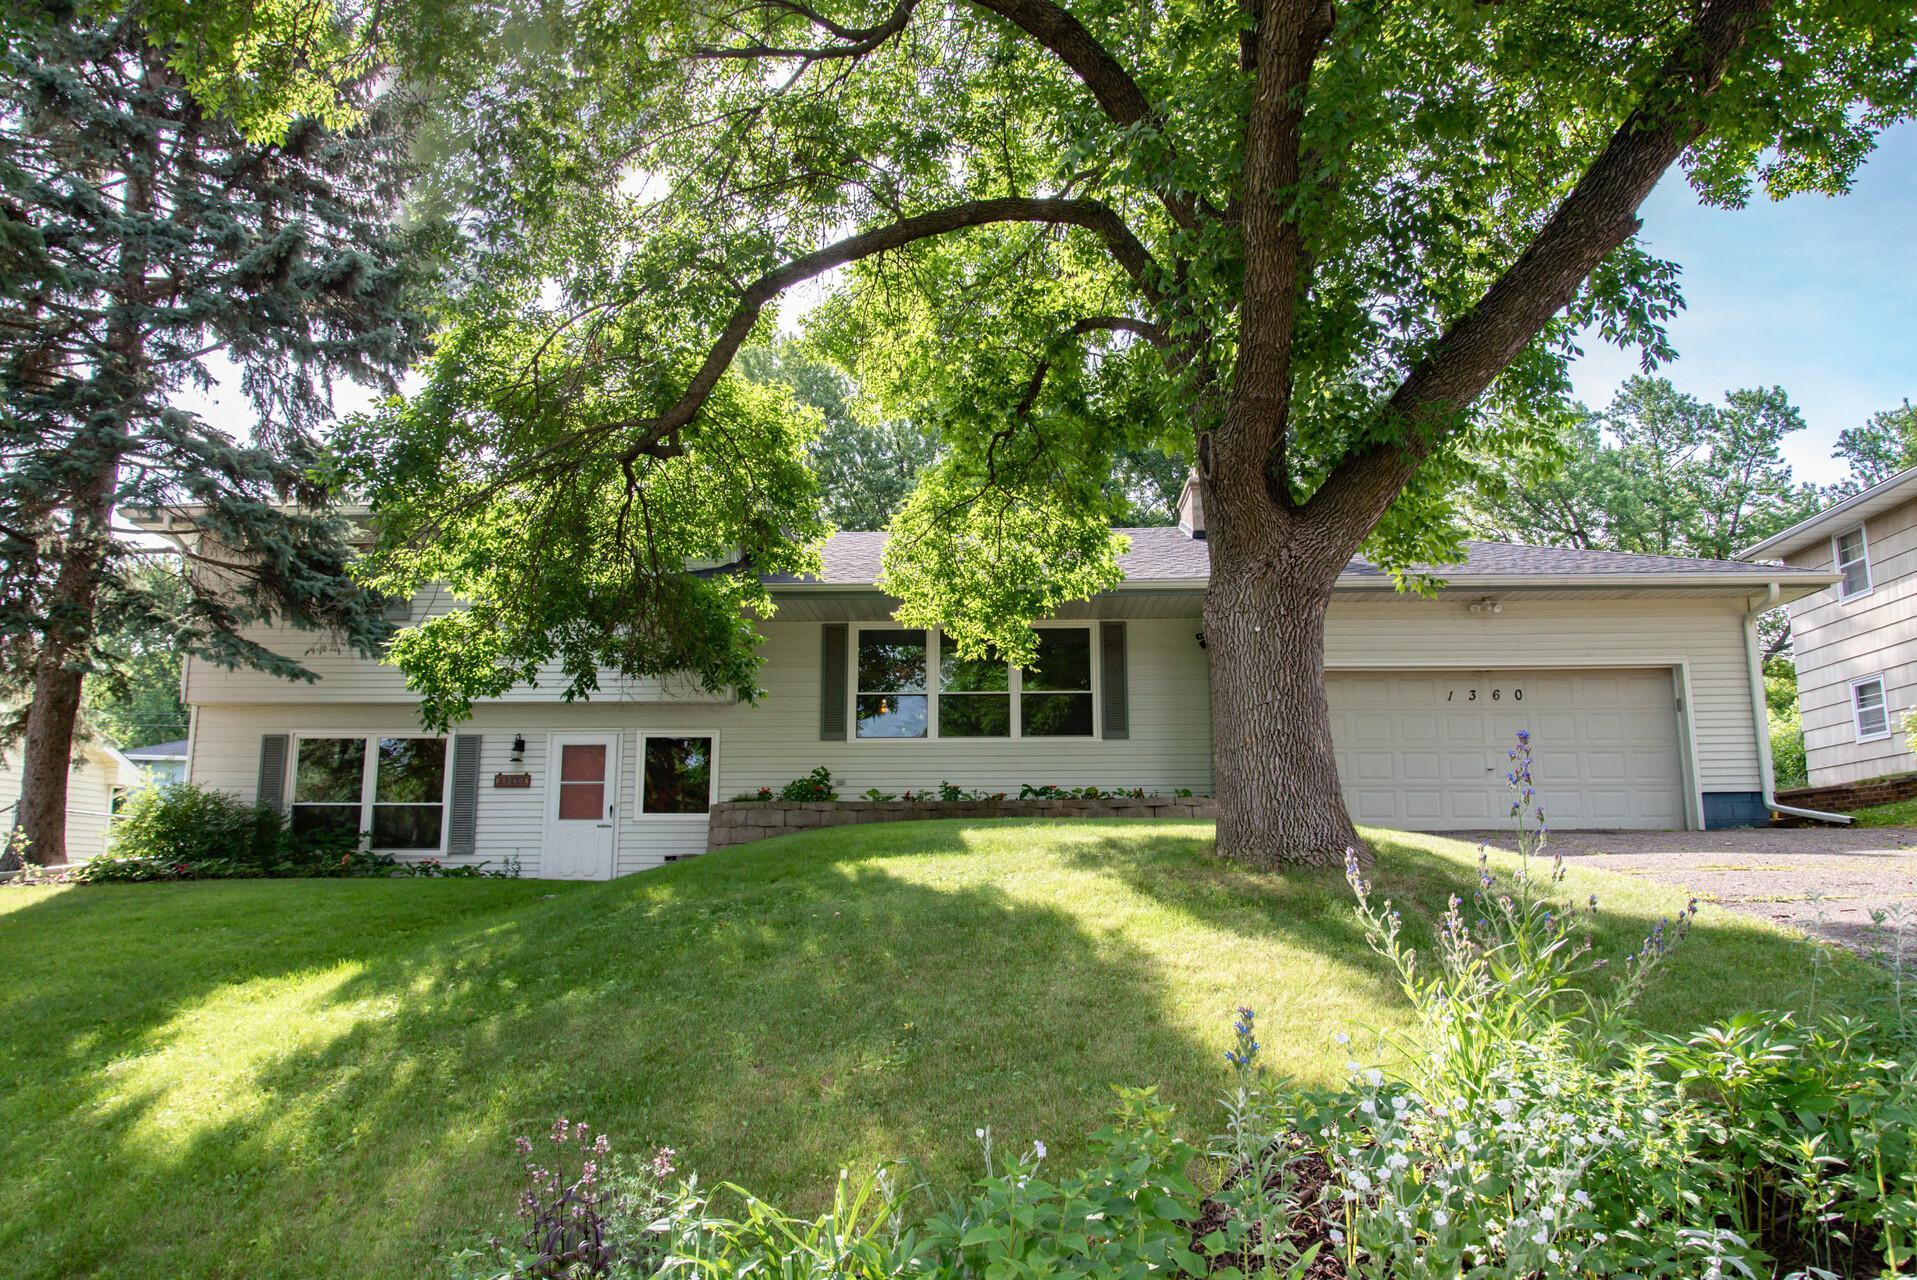 1360 Pierce NE Property Photo - Columbia Heights, MN real estate listing